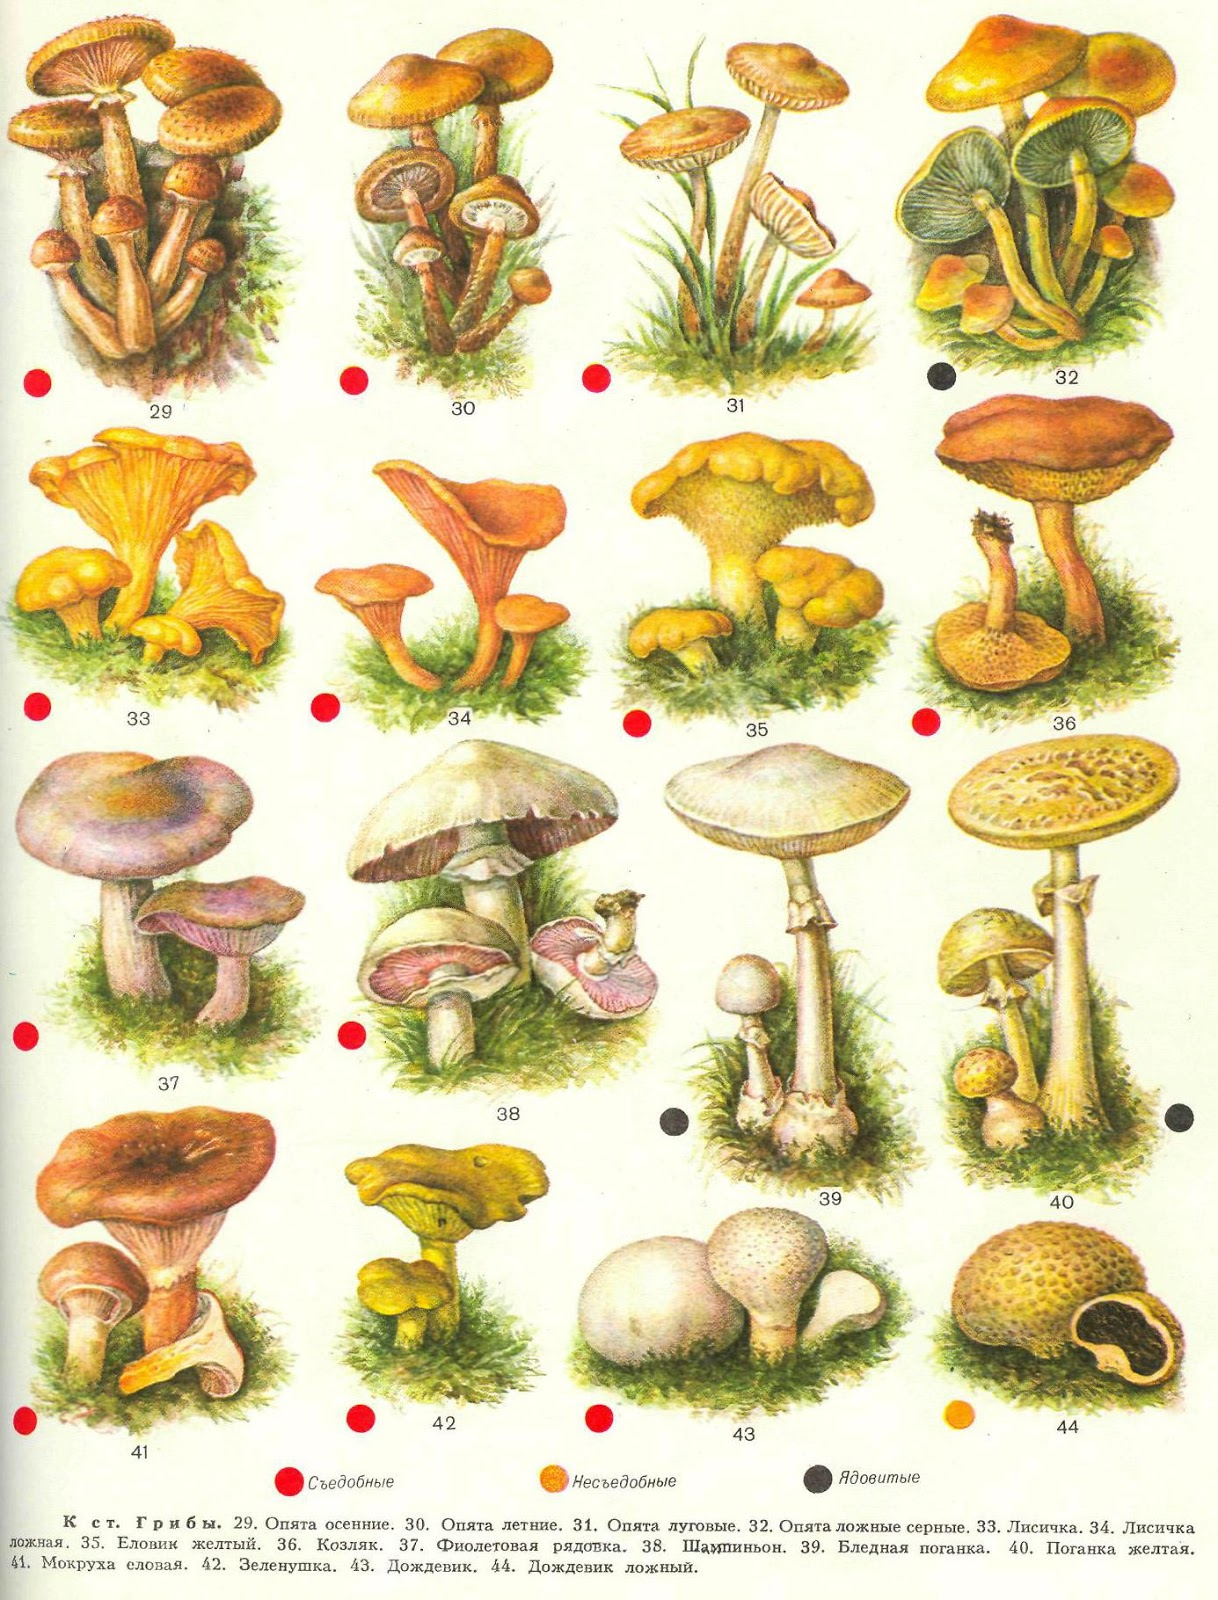 фото съедобных грибов с названиями и